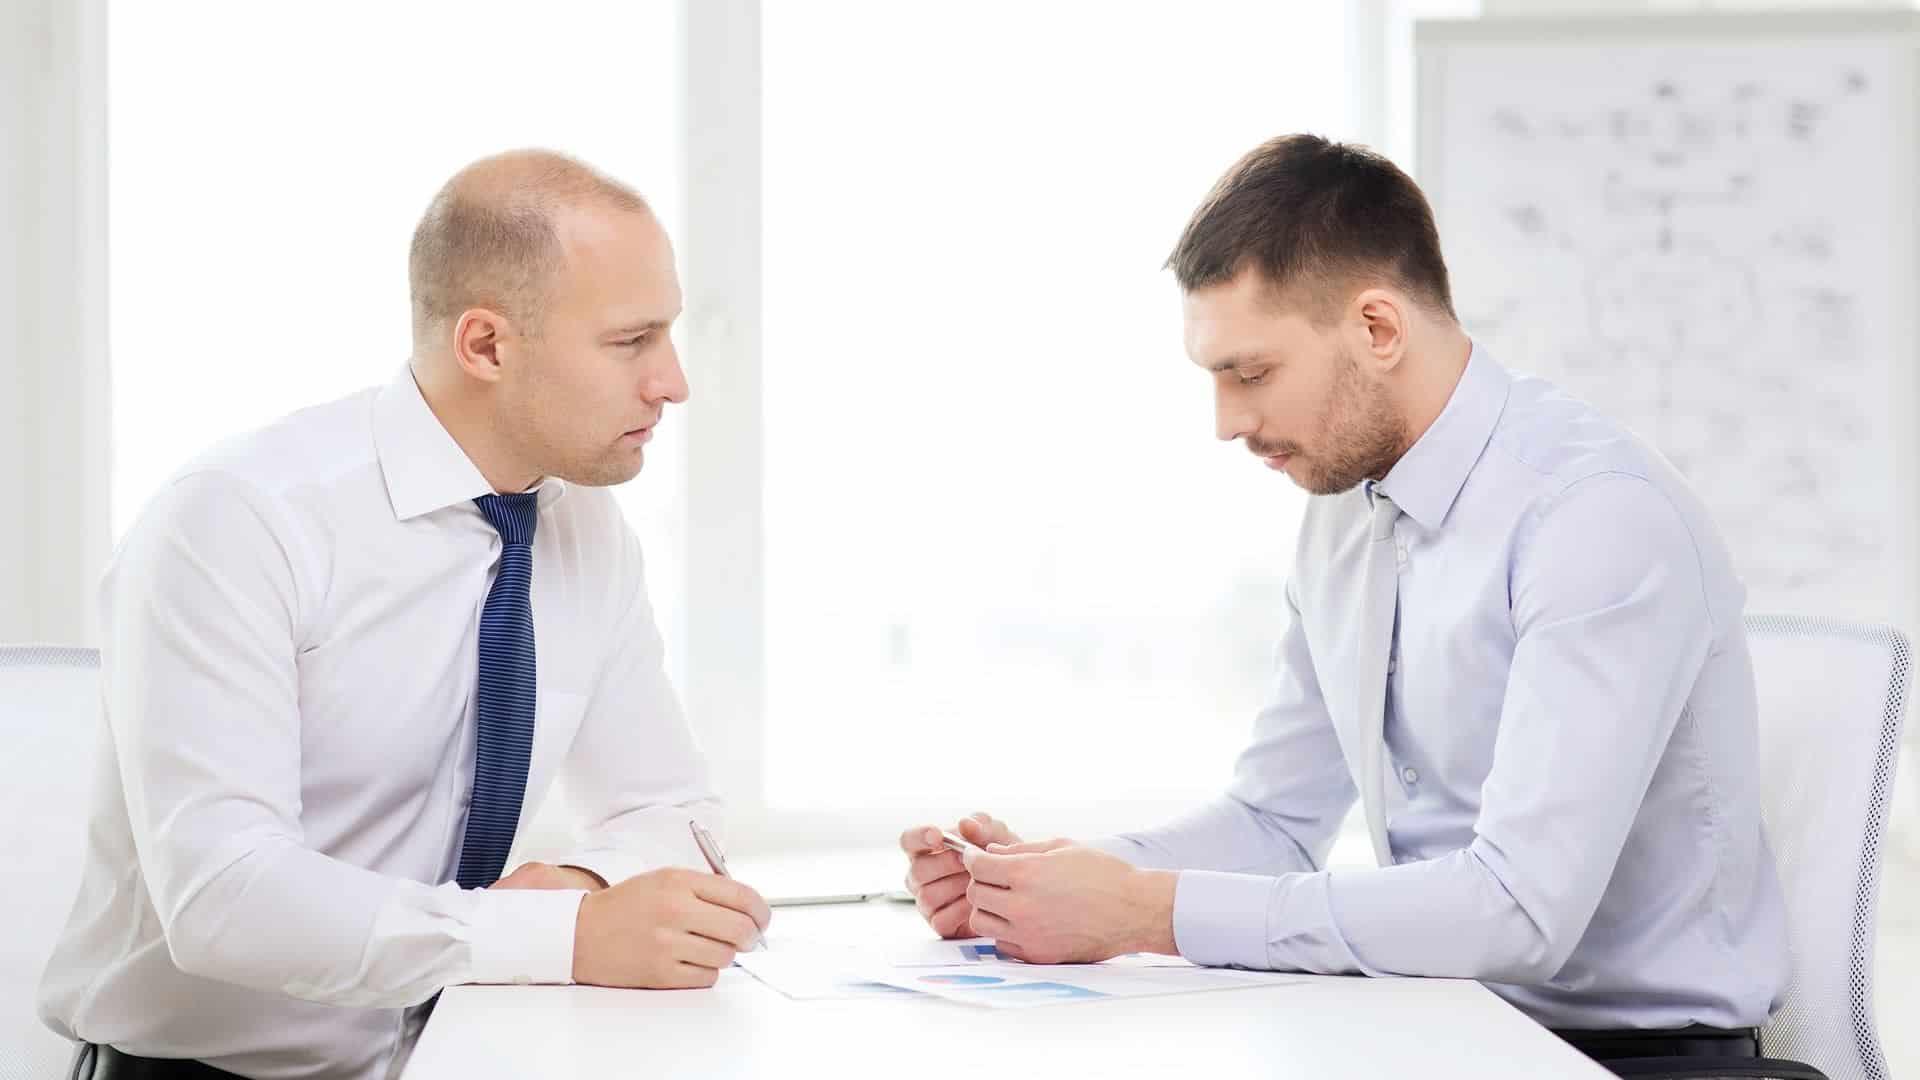 Disciplinary Meetings - No Win No Fee